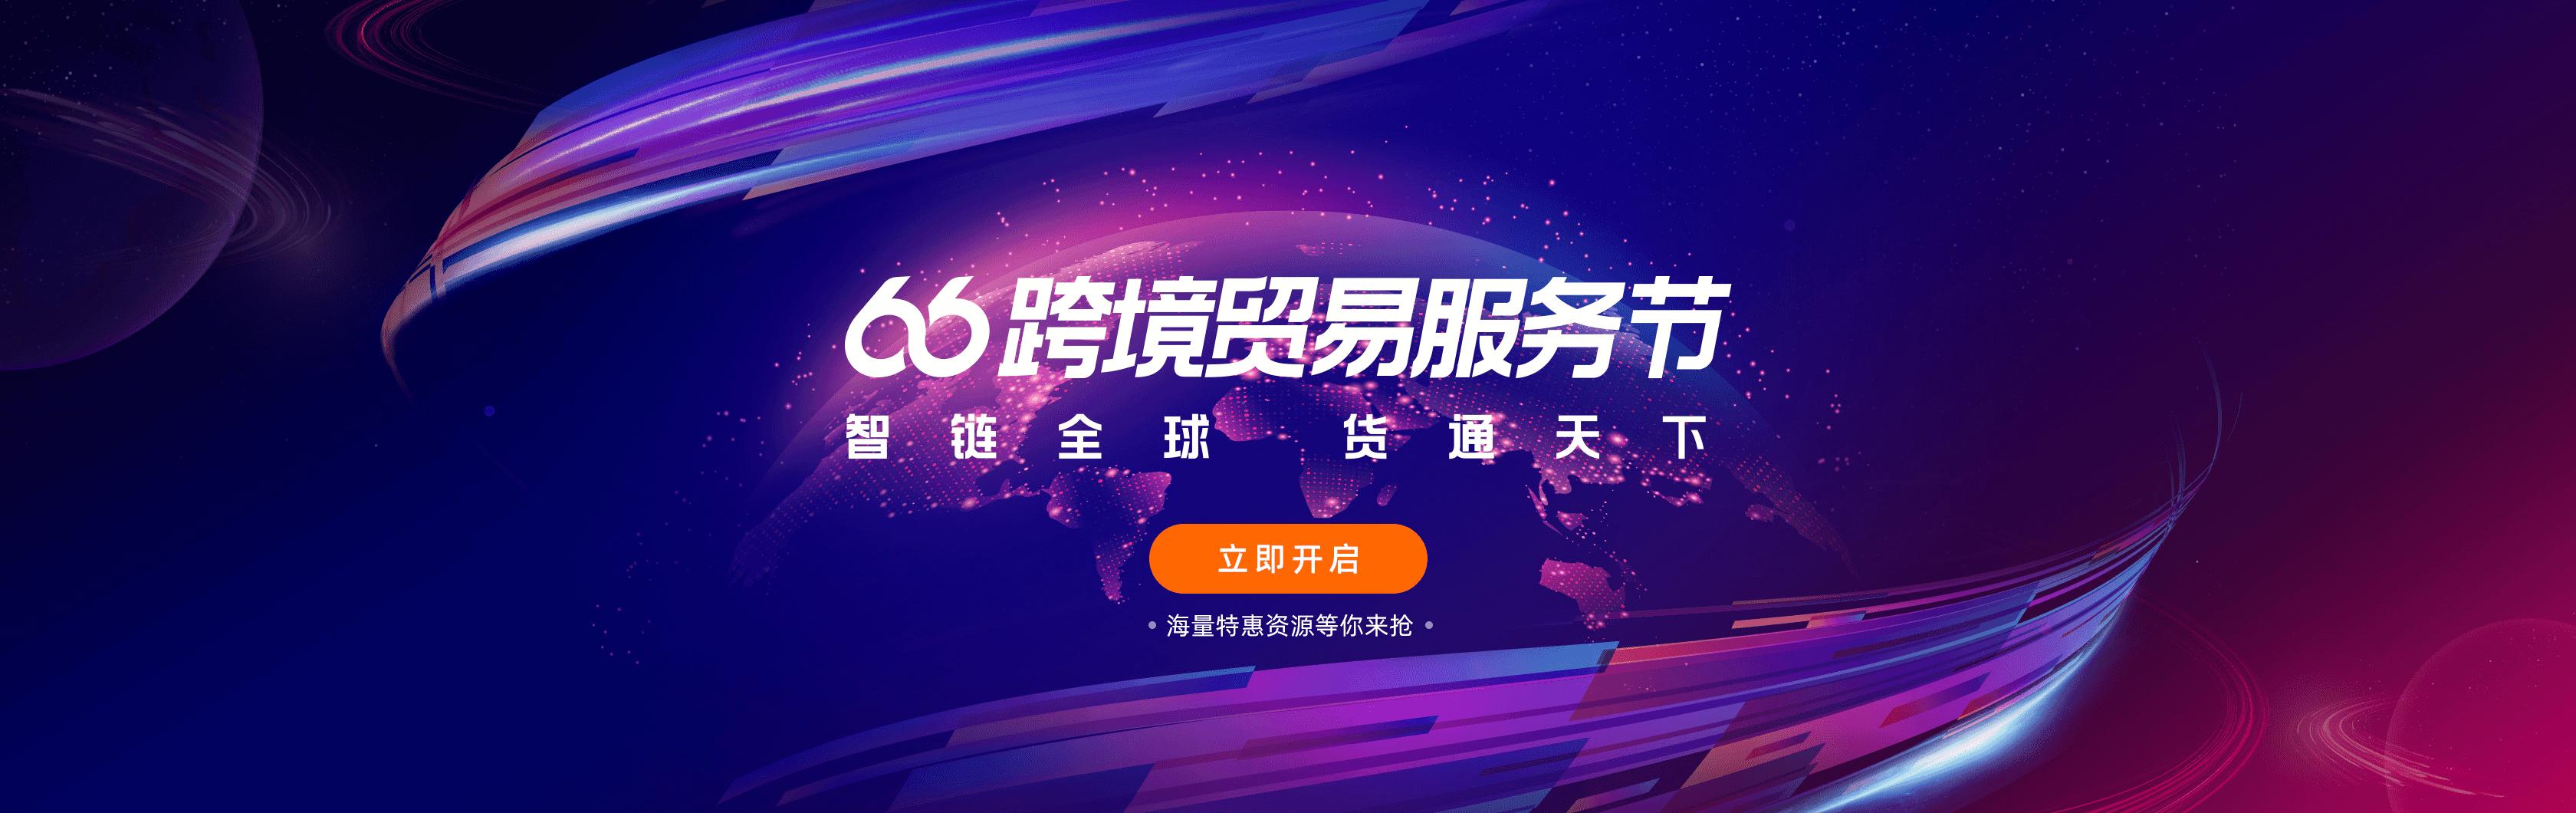 企业网站banner图